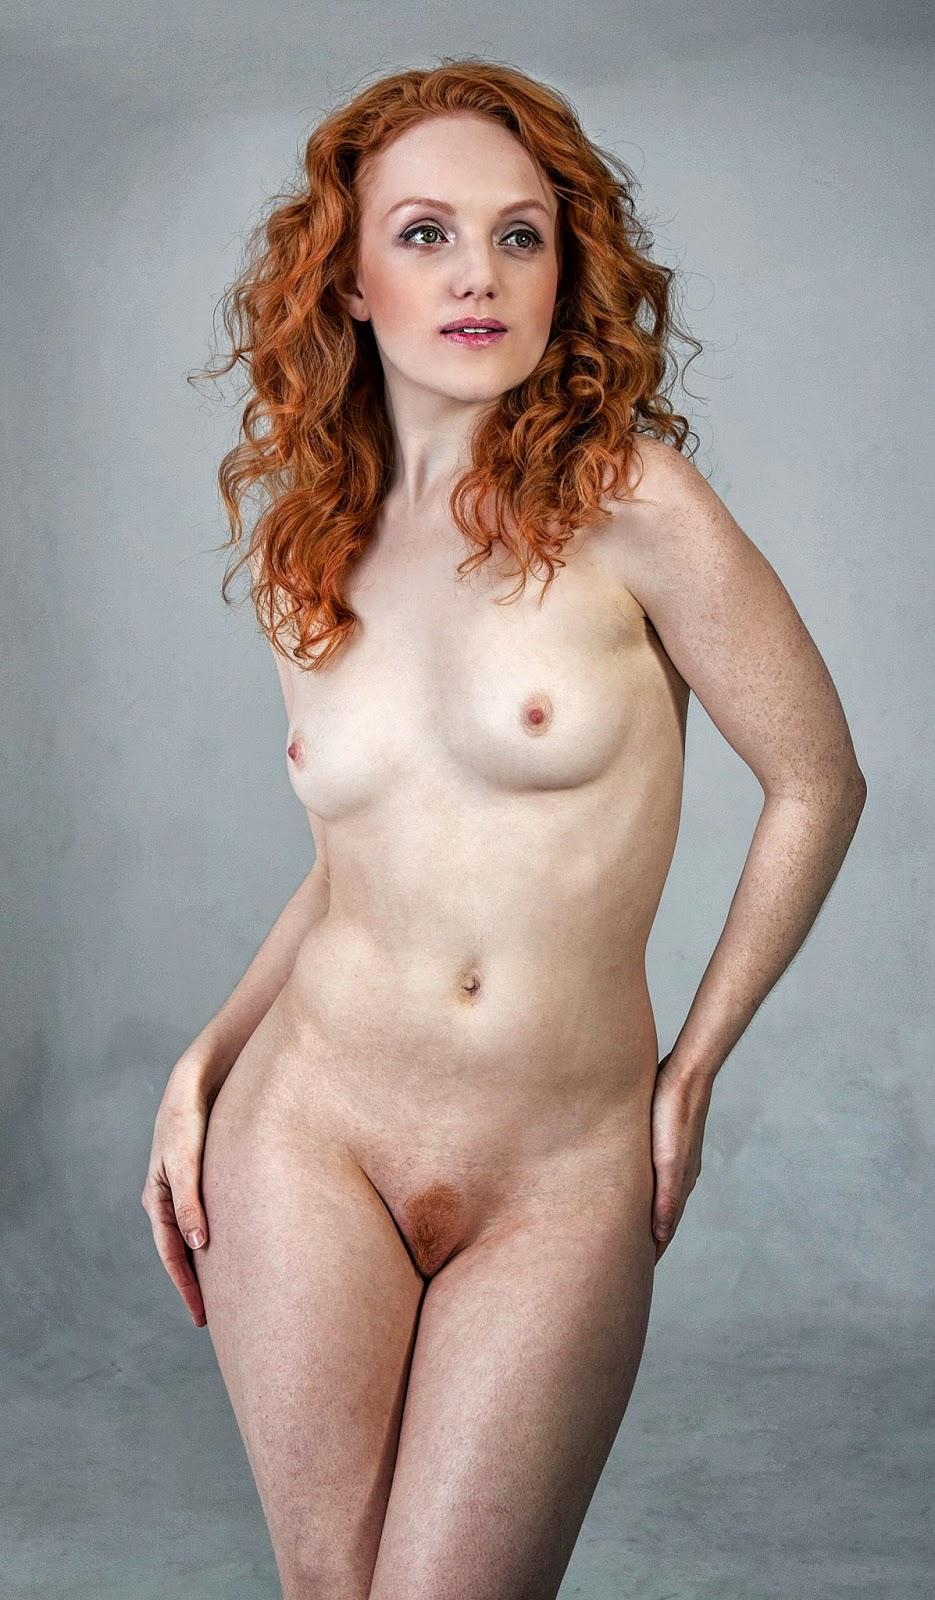 barbara bermudo nude leaked pic